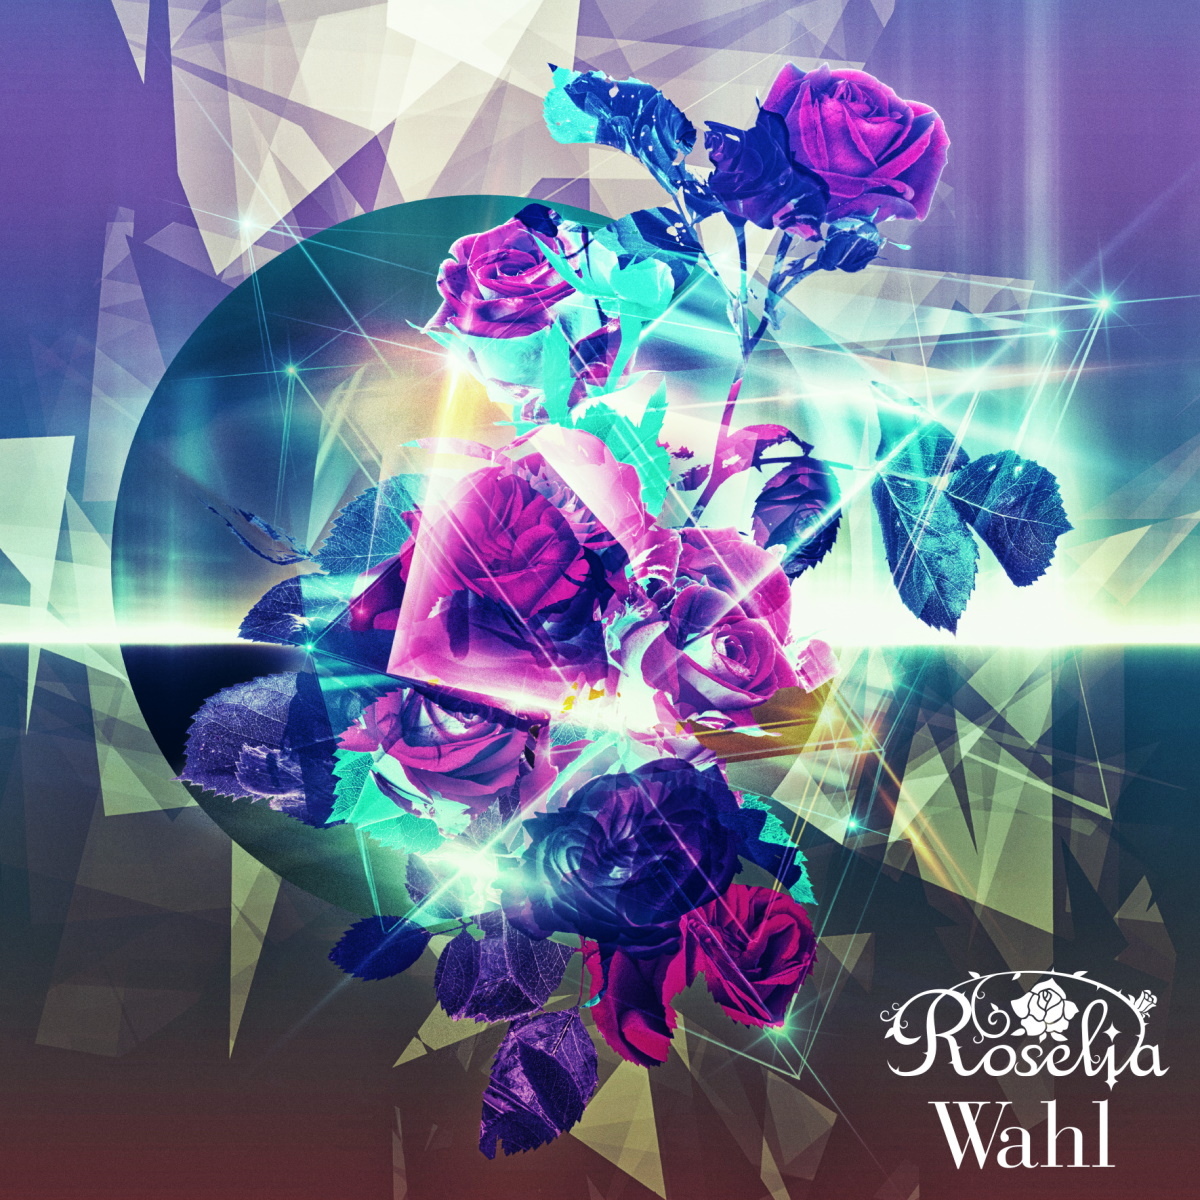 『Roselia - Song I am.』収録の『Wahl』ジャケット